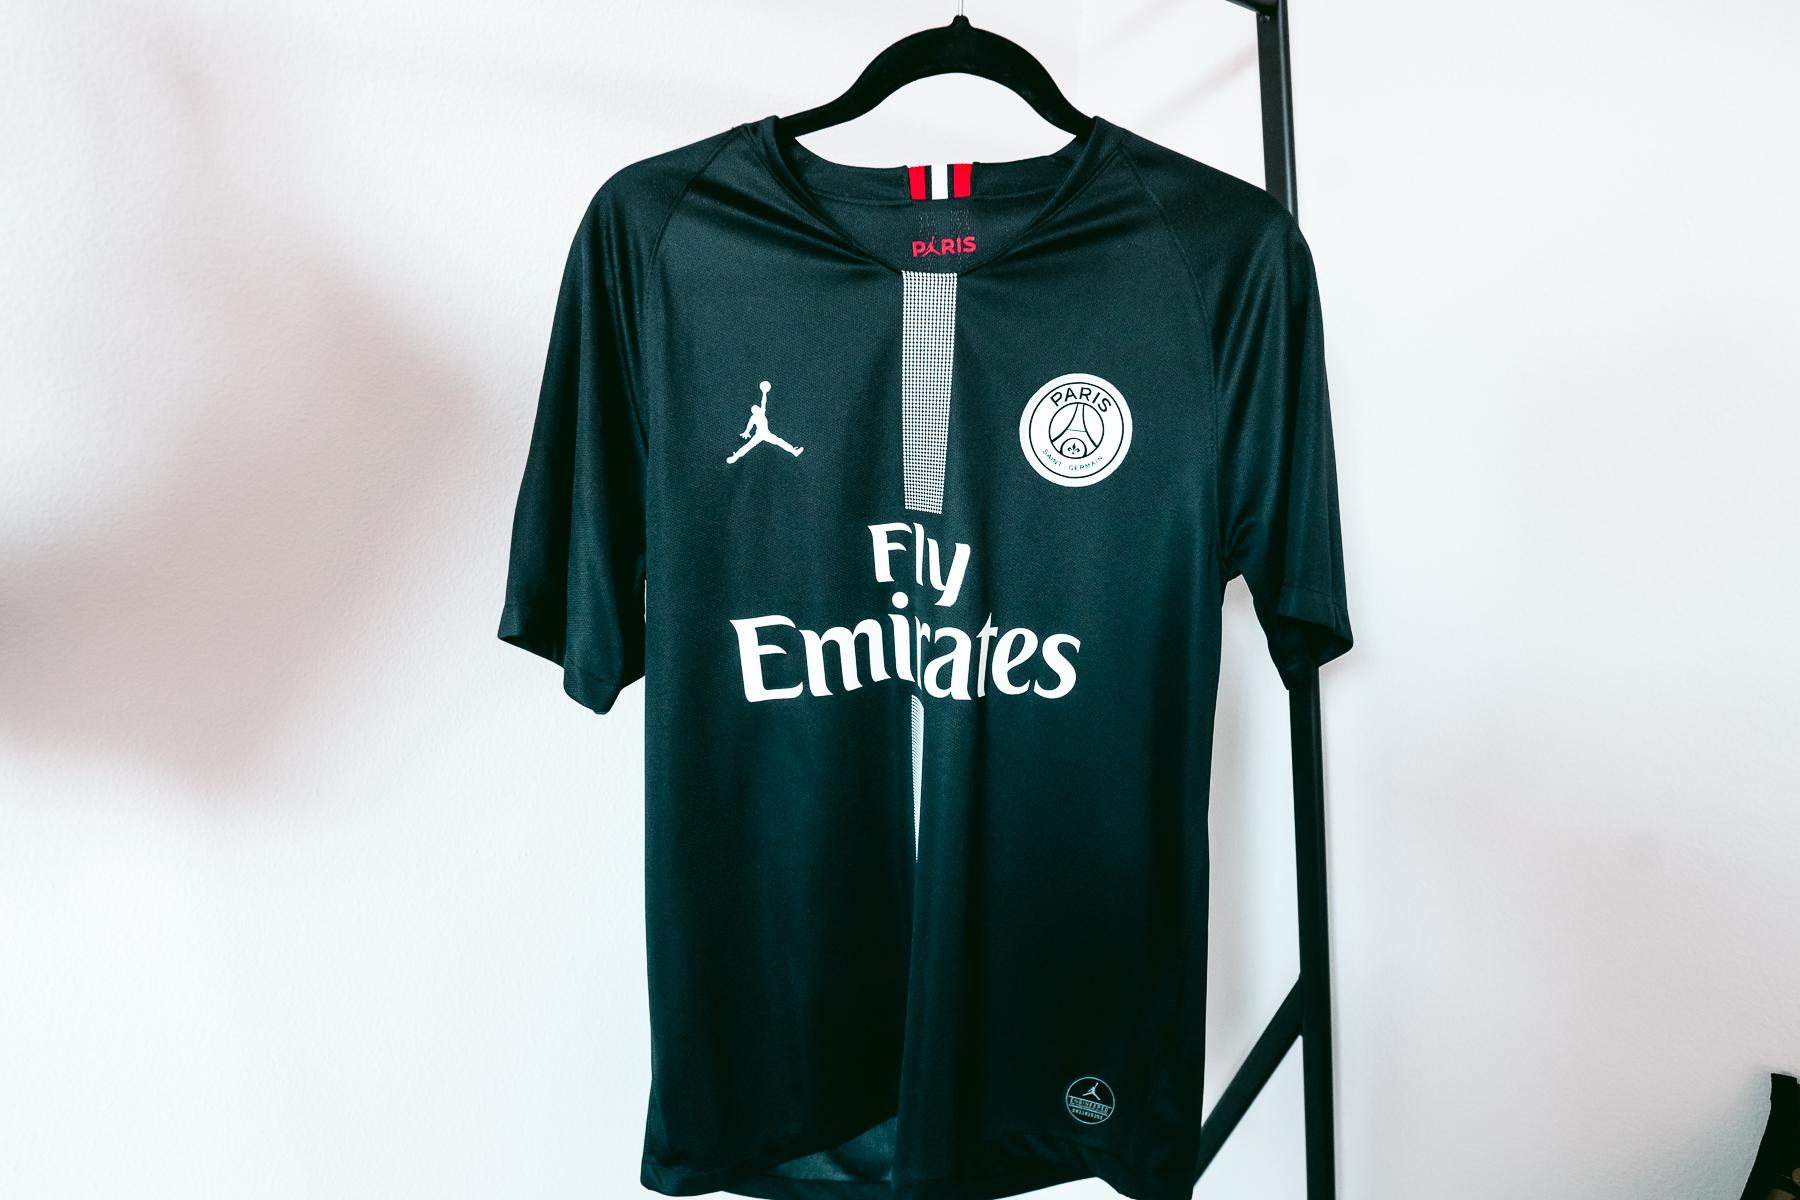 Jordan Brand Jordan X Paris Saint Germain 2018 19 Stadium Third Jersey Grailed